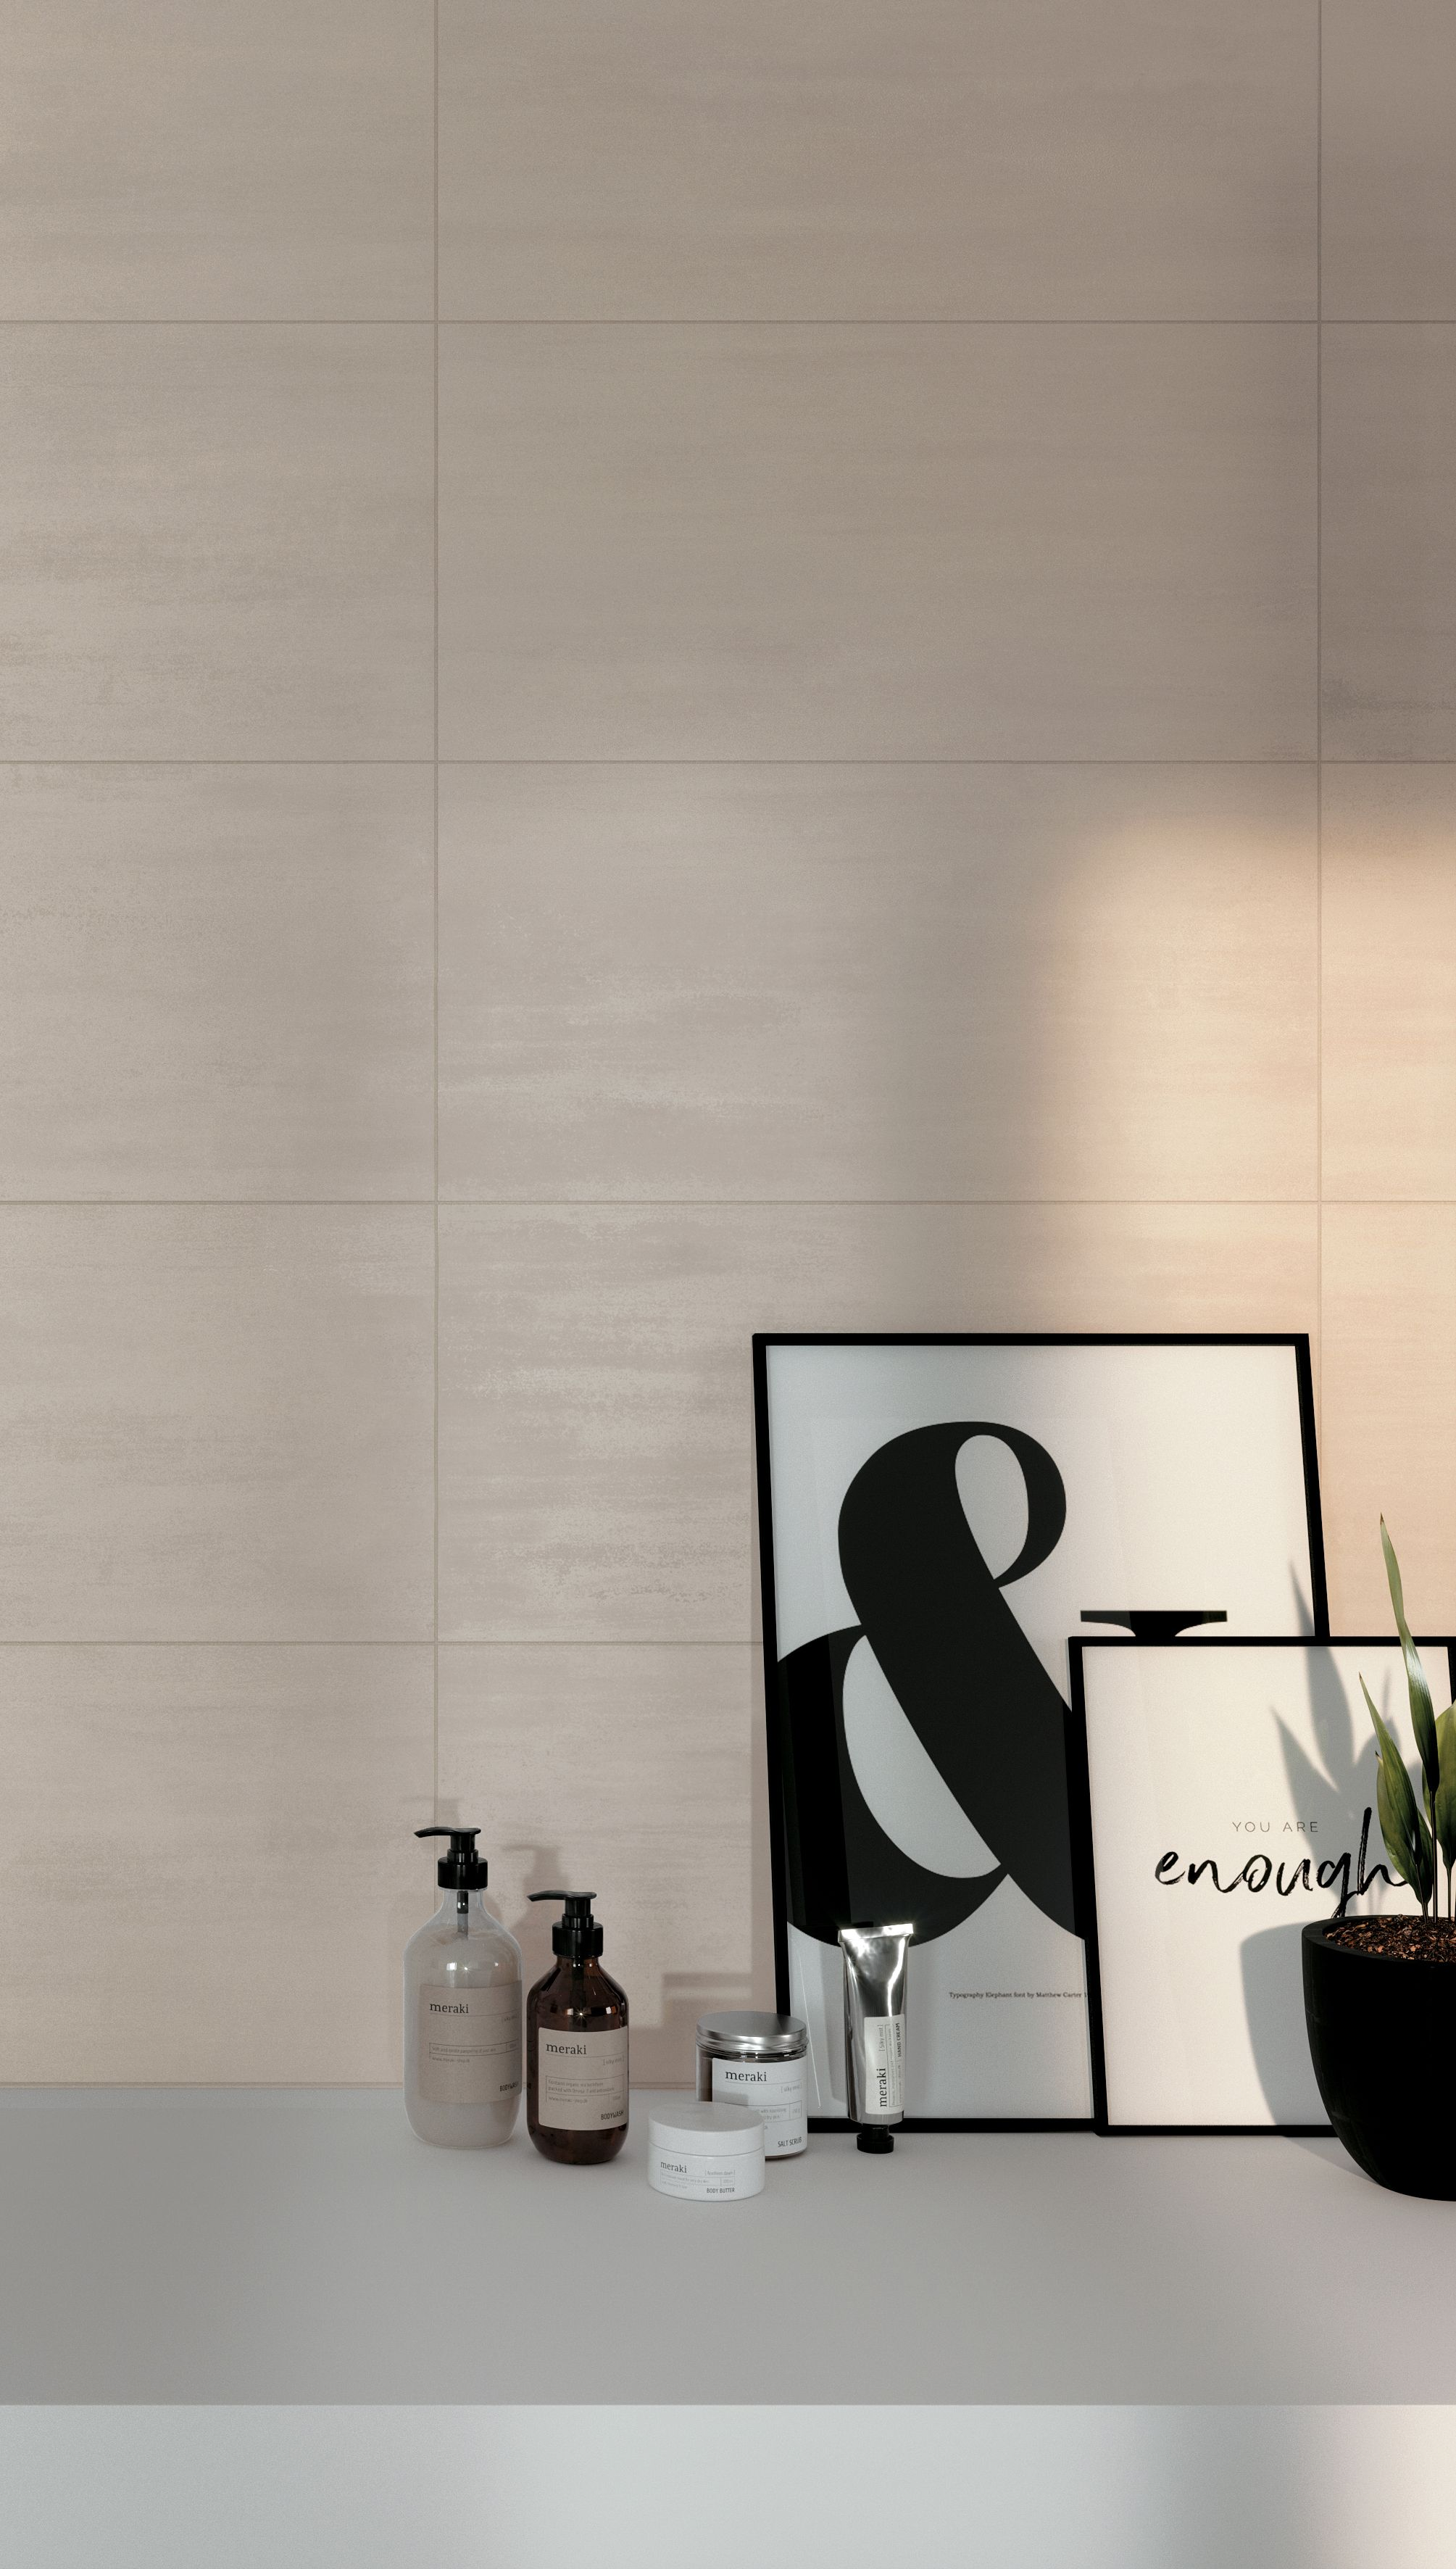 Hirati Decoration Salle De Bain Salle De Bain Et Carrelage Blanc